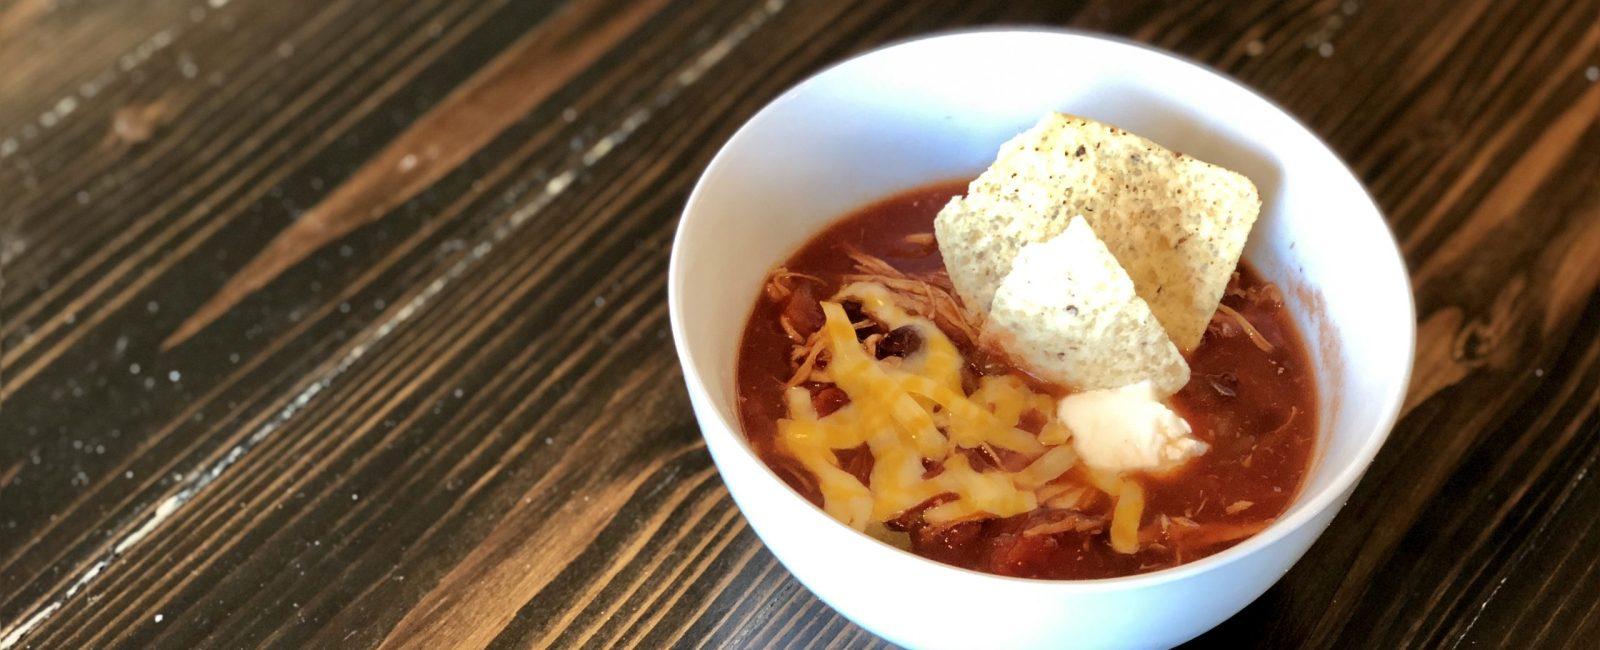 Simple Slow Cooker Chicken Tortilla Soup Recipe